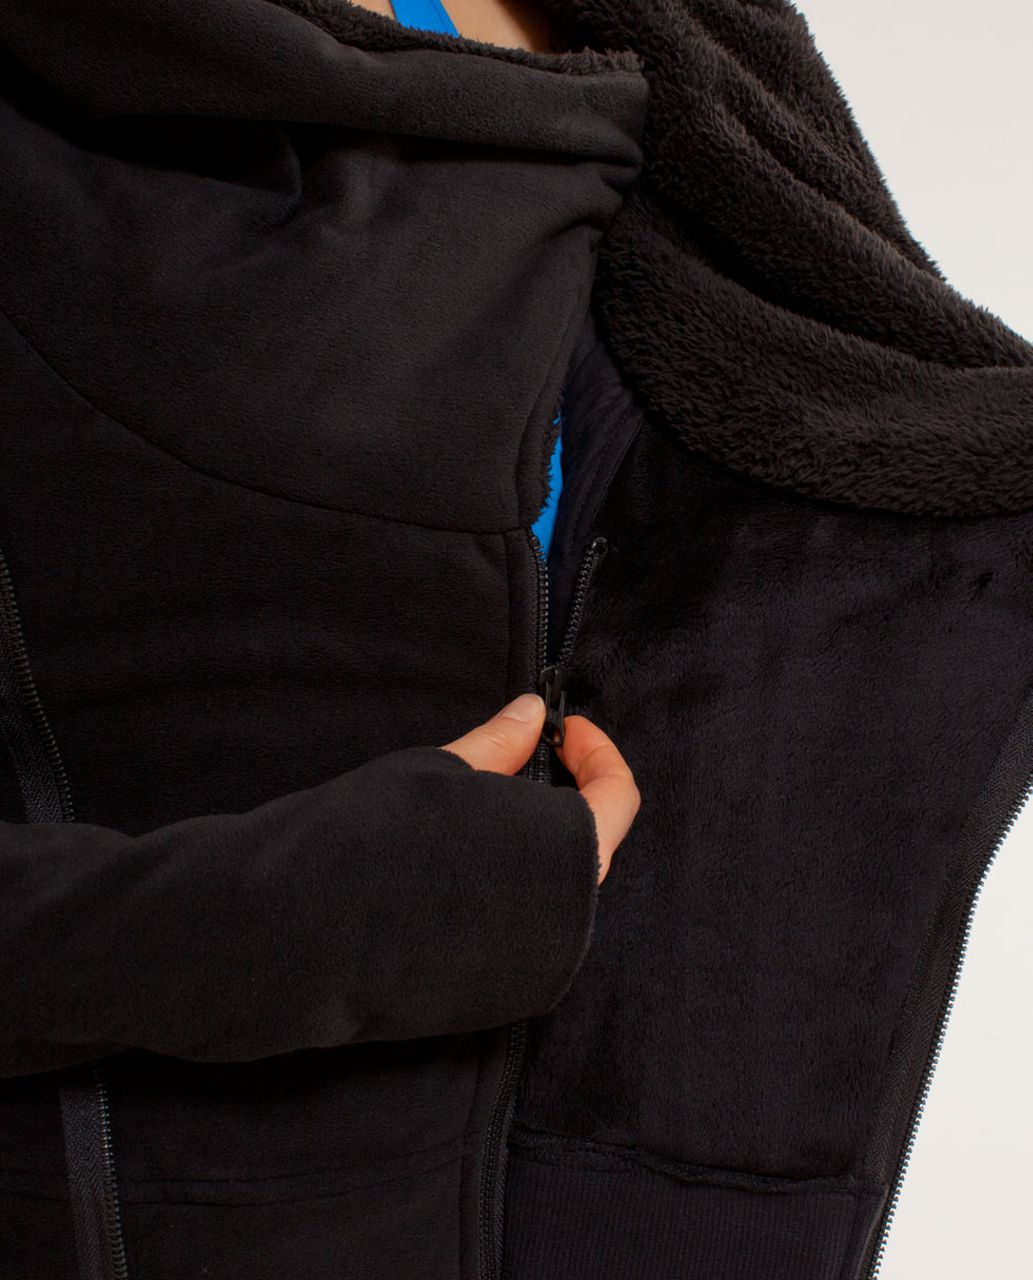 Lululemon Off The Mat Jacket - Black